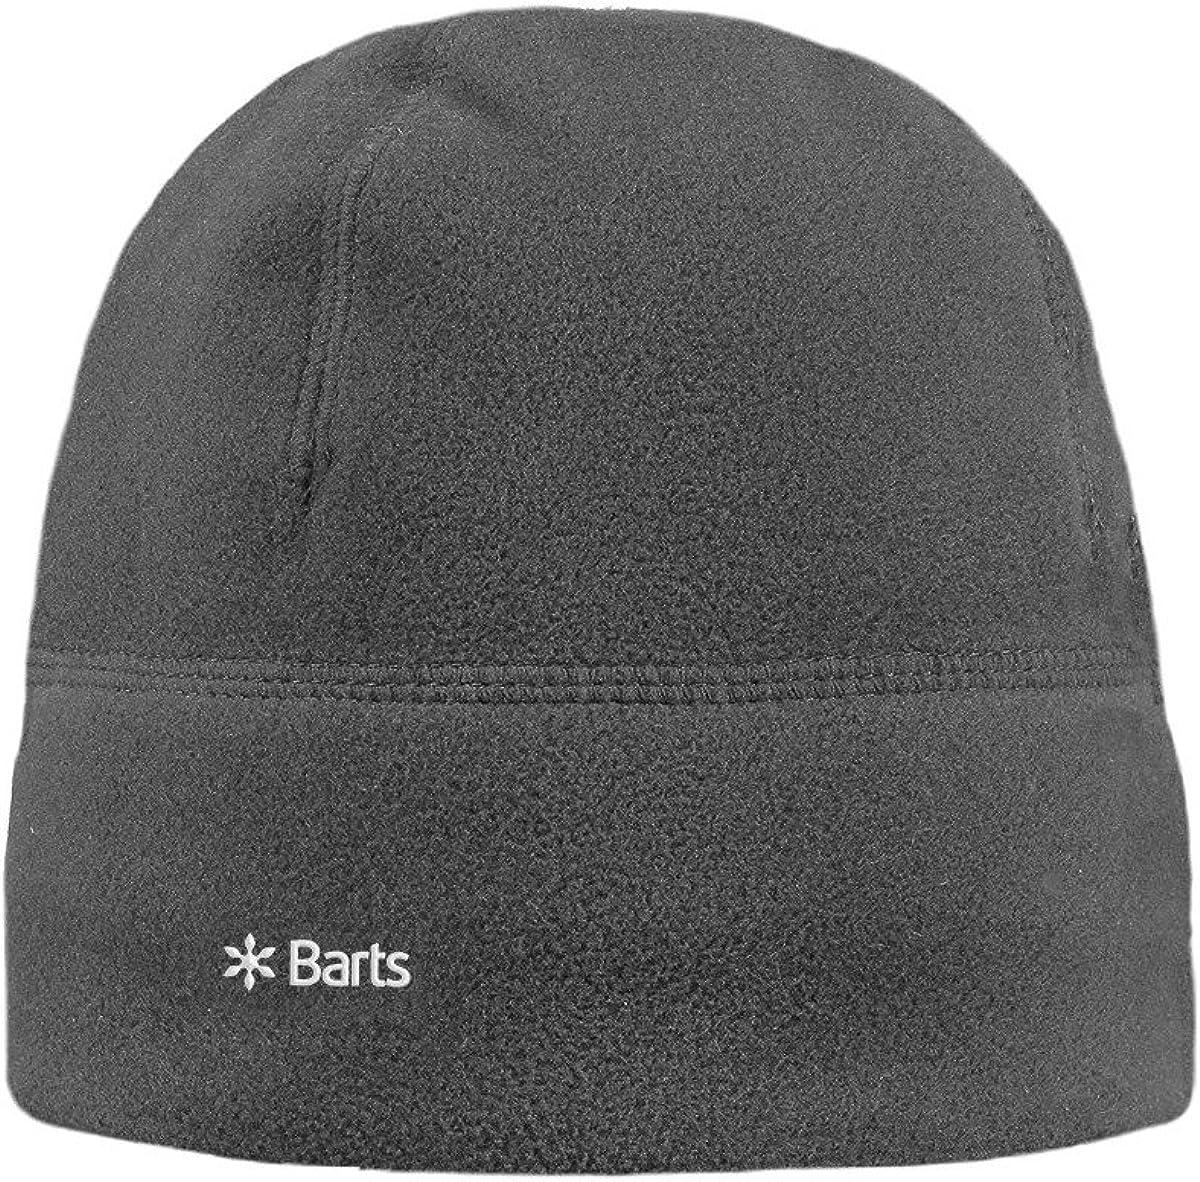 Barts Basic Beanie Earmuffs